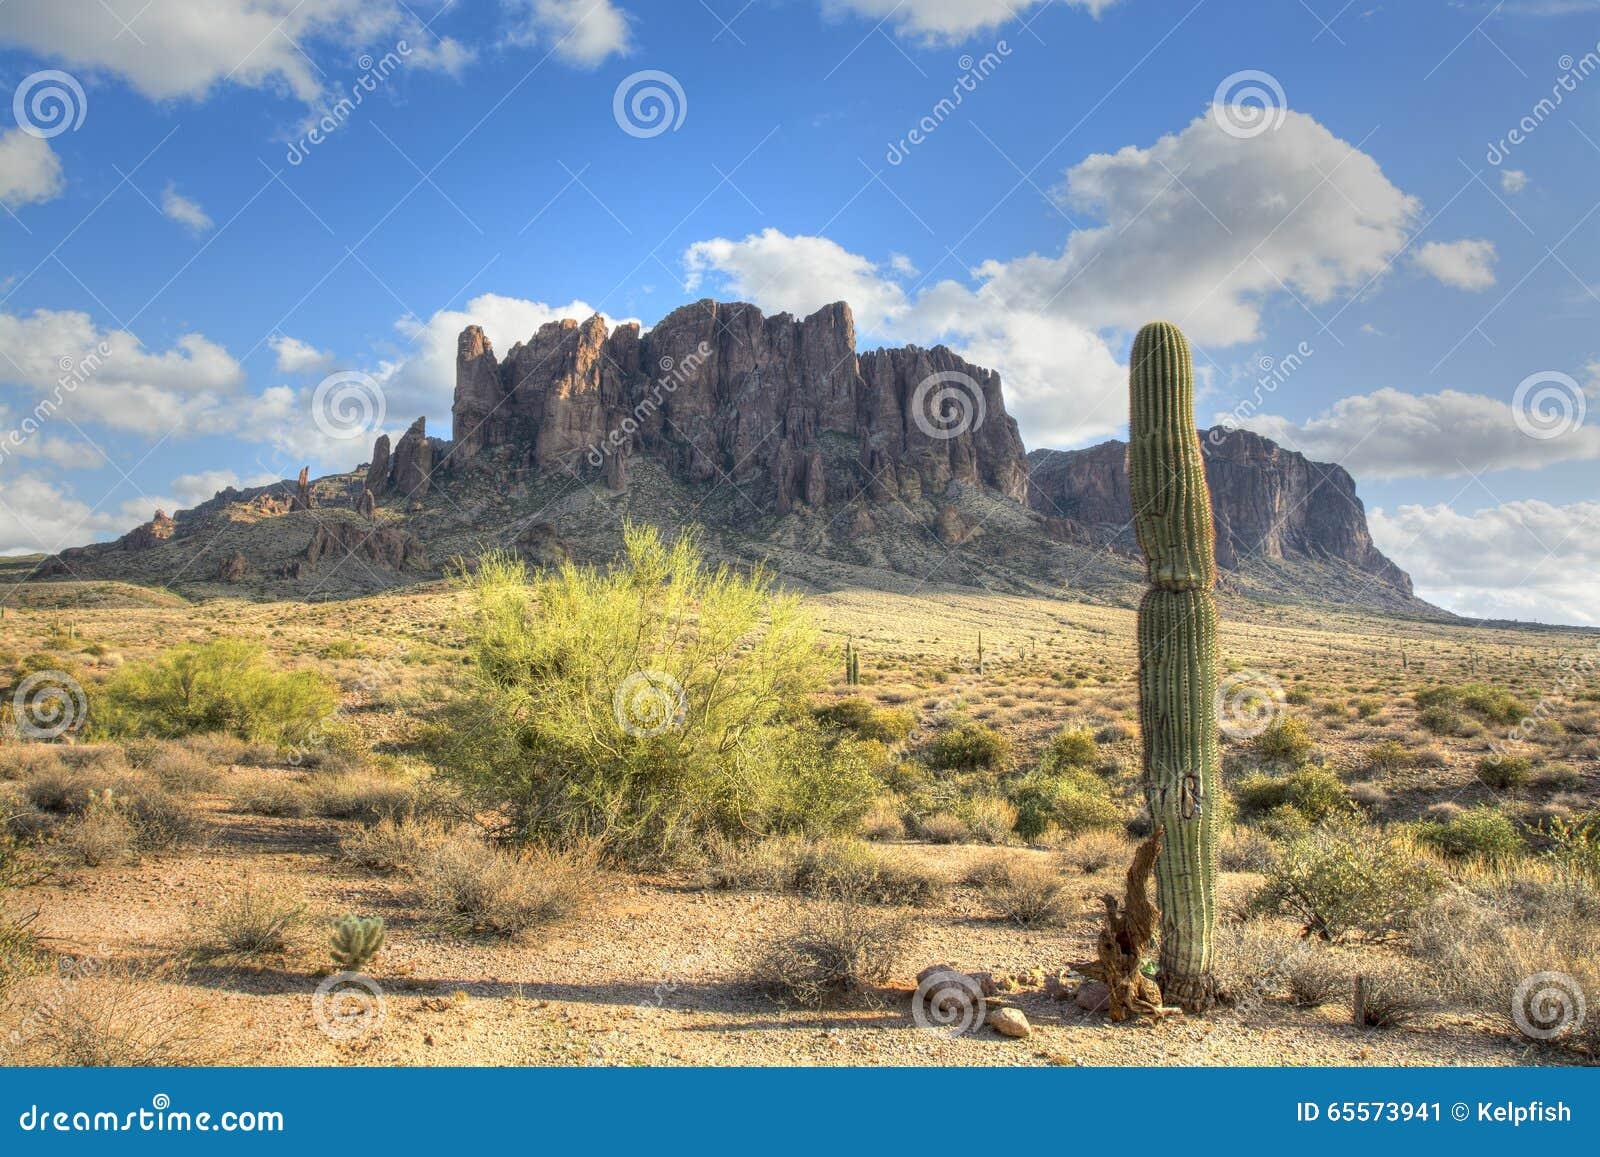 Aberglaube-Berg in Arizona